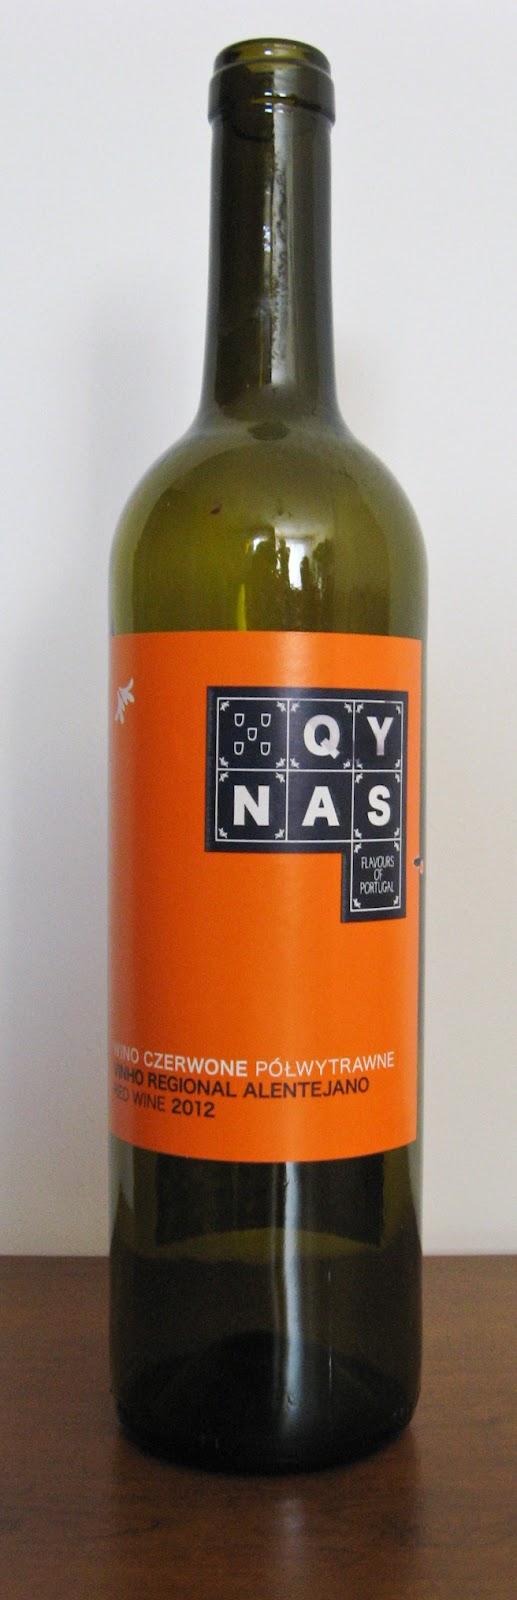 Wino z Biedronki